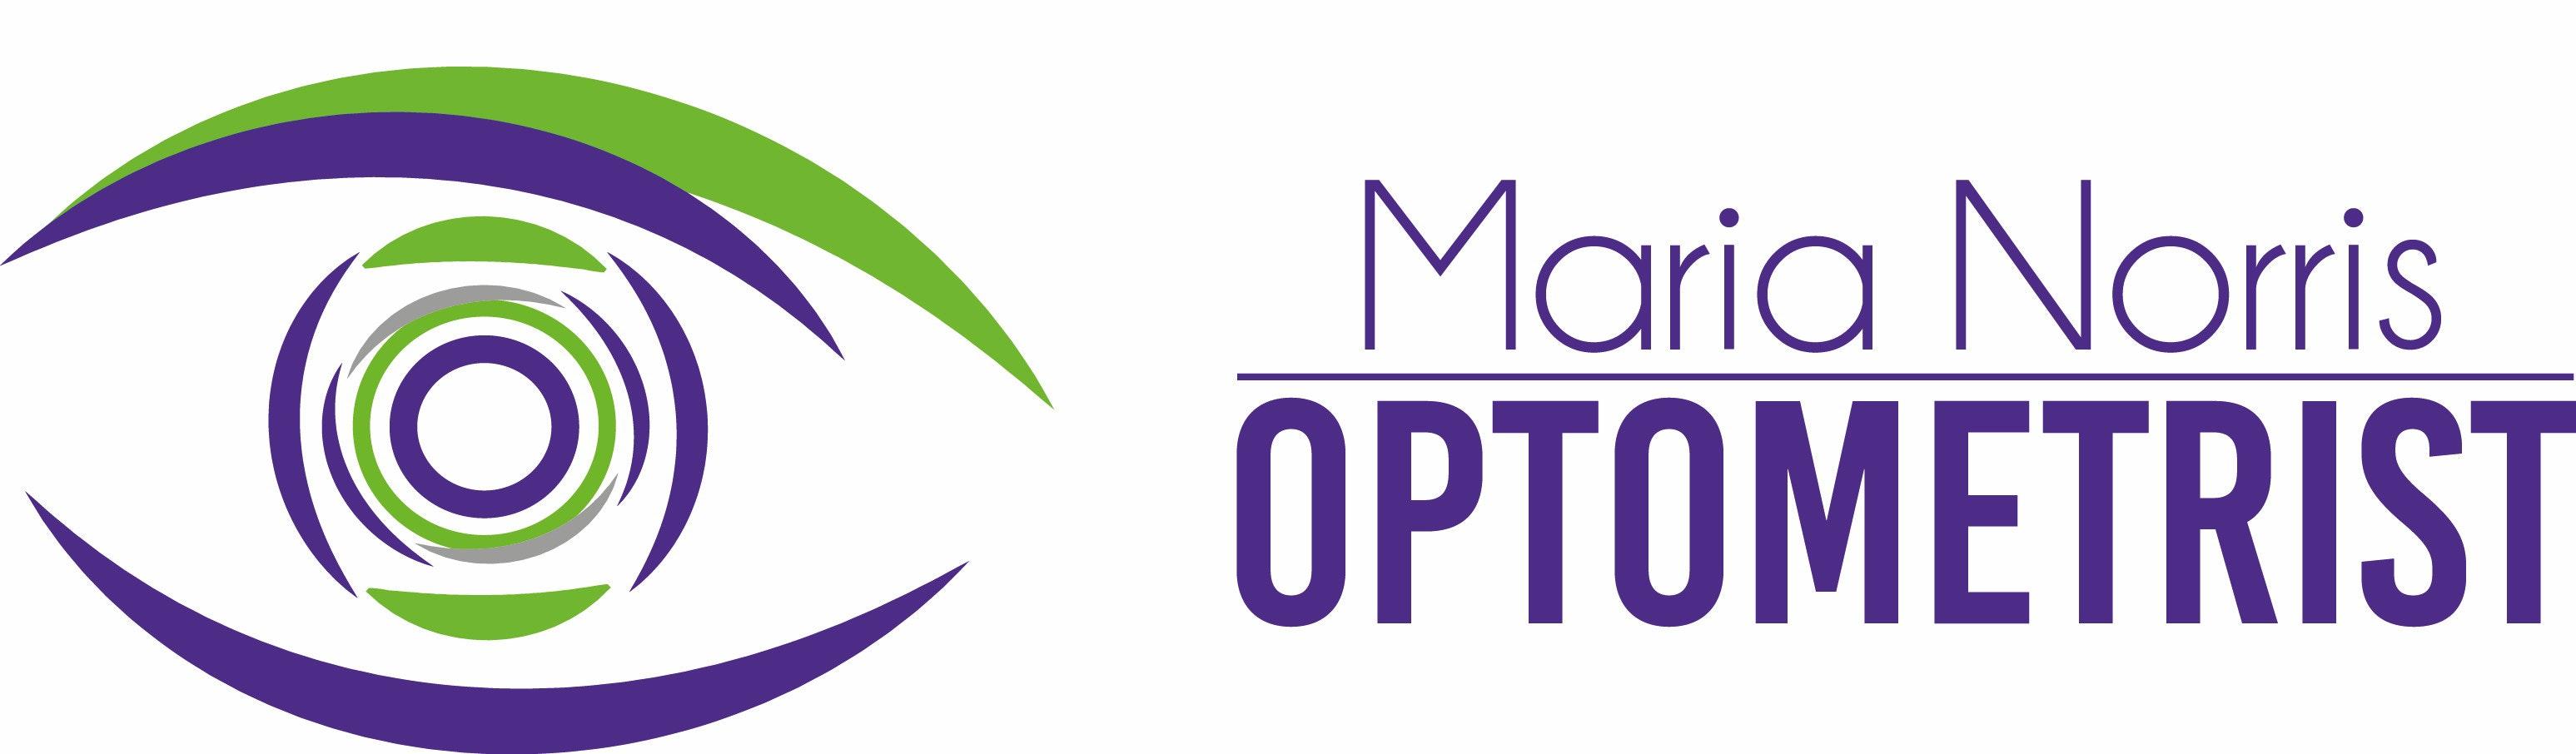 logo for Maria Norris Optometrist Optometrists